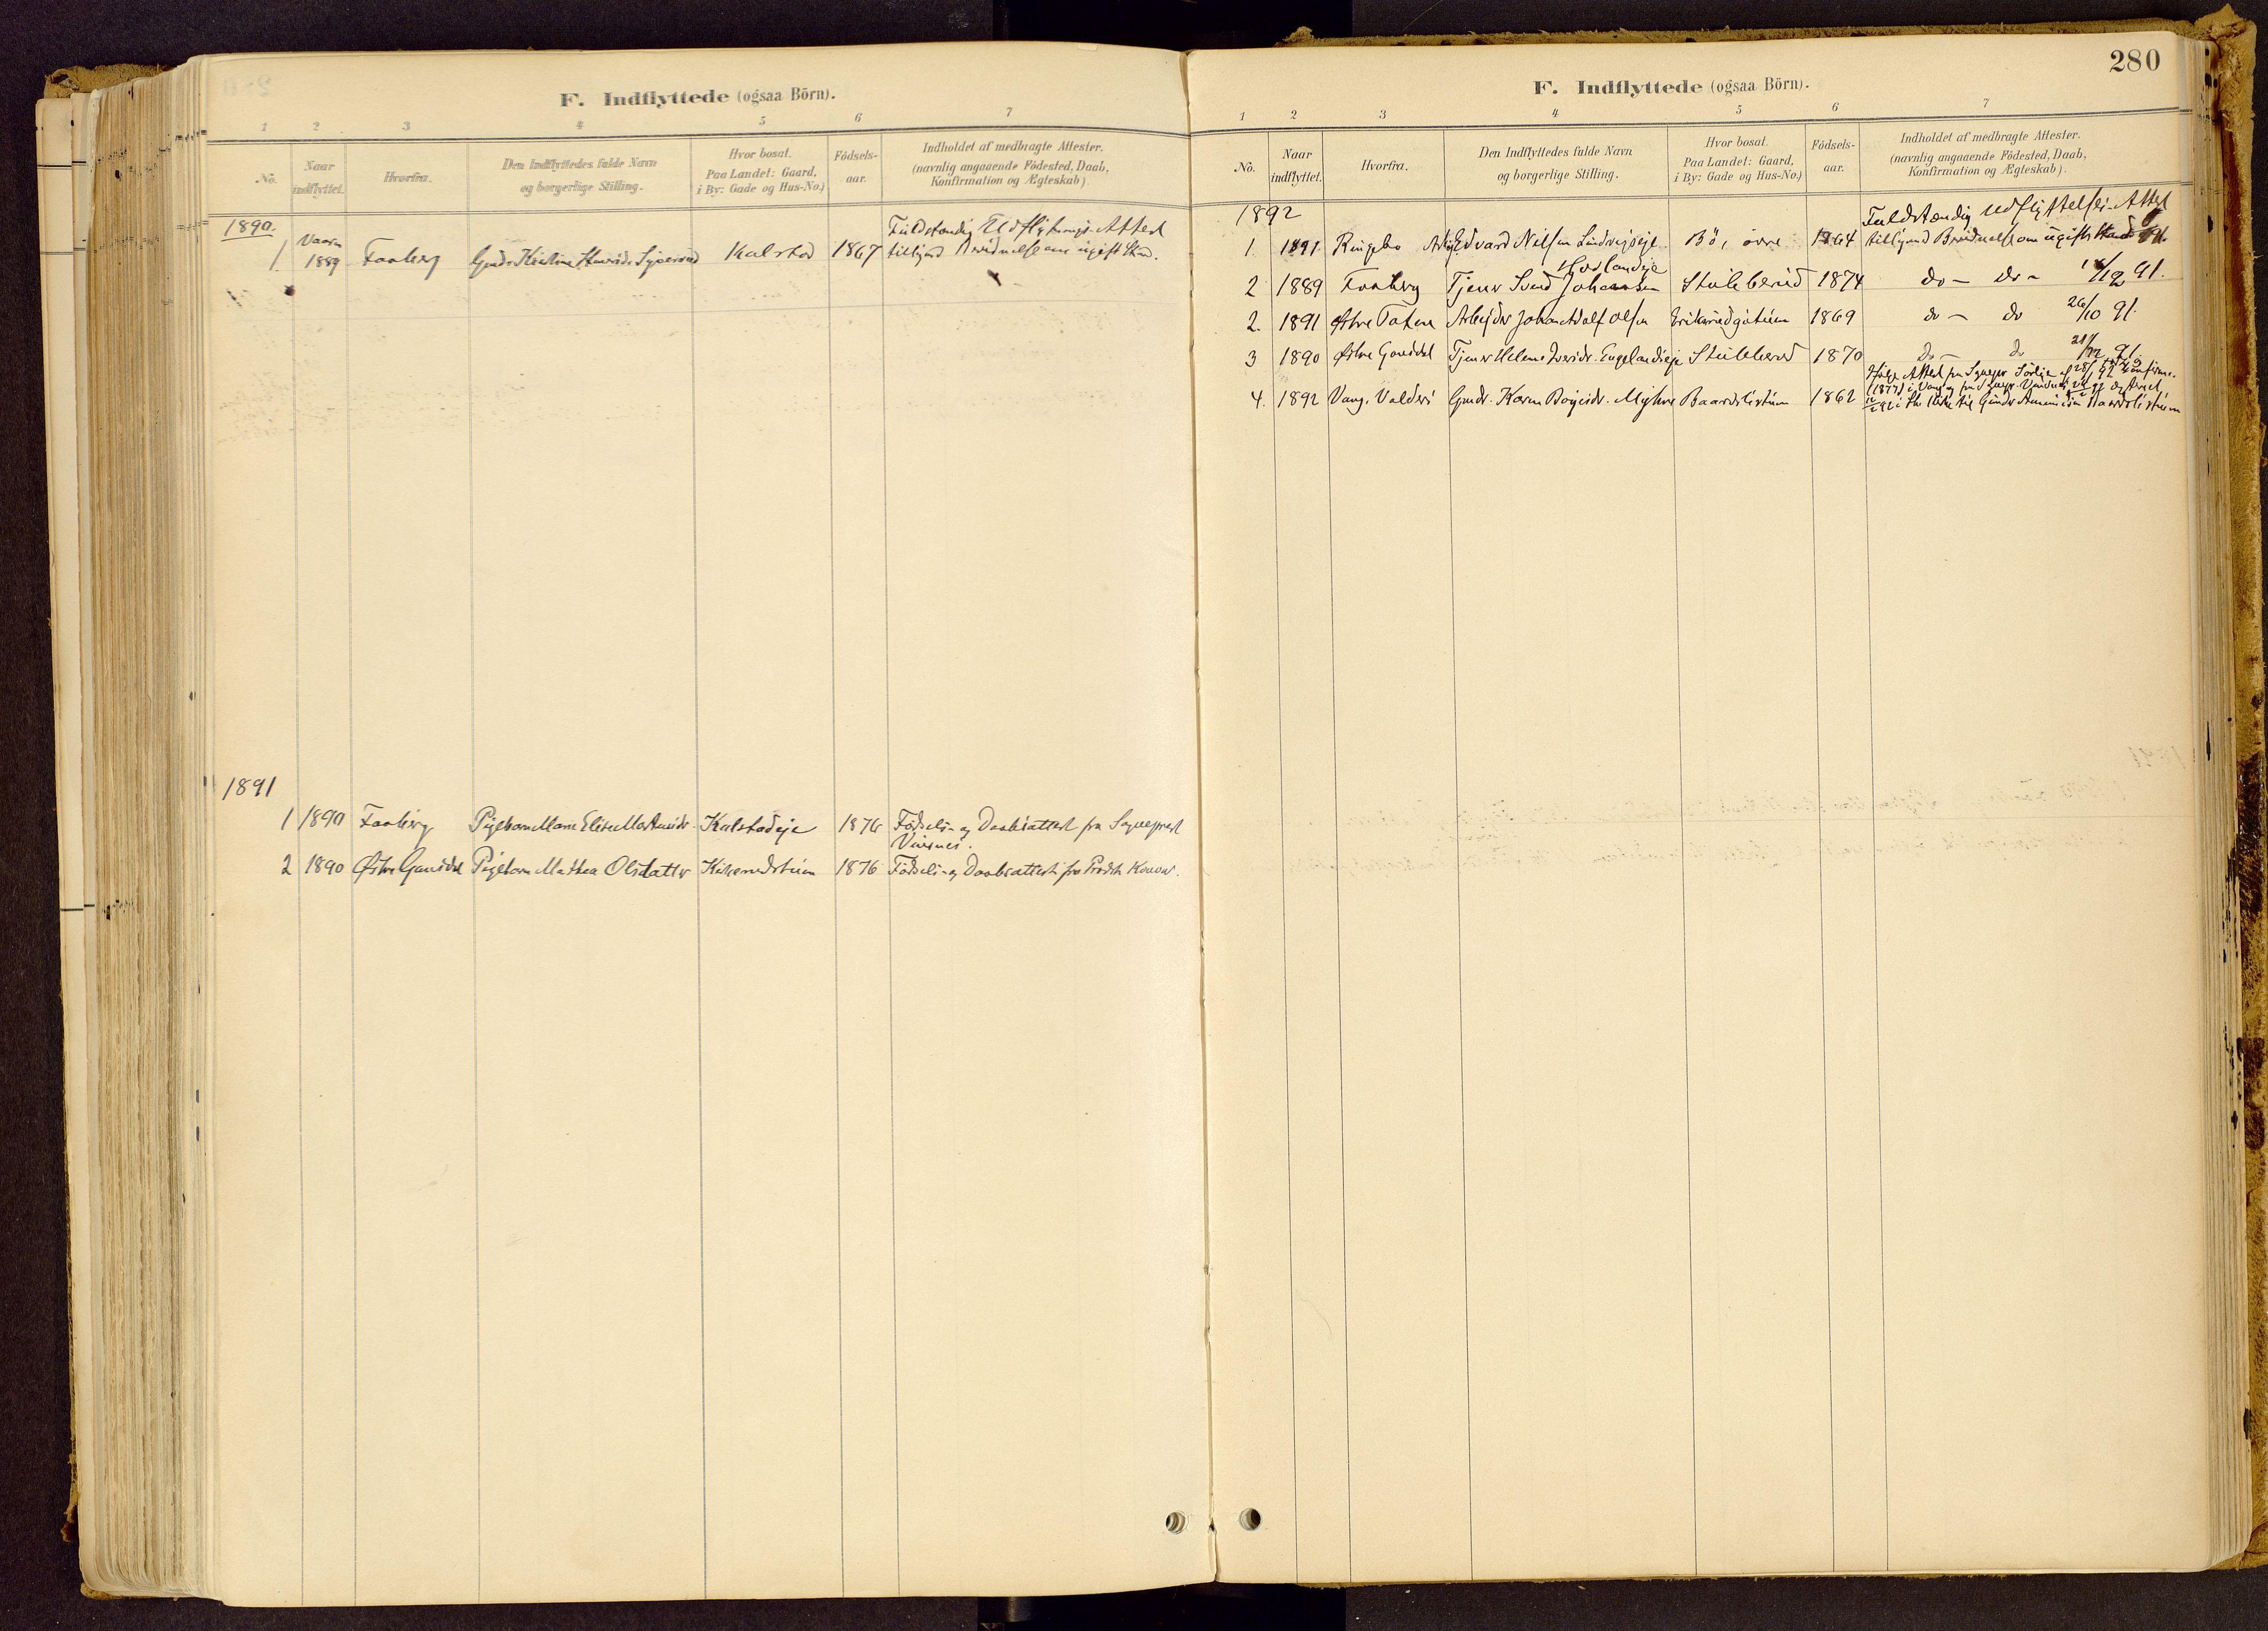 SAH, Vestre Gausdal prestekontor, Ministerialbok nr. 1, 1887-1914, s. 280